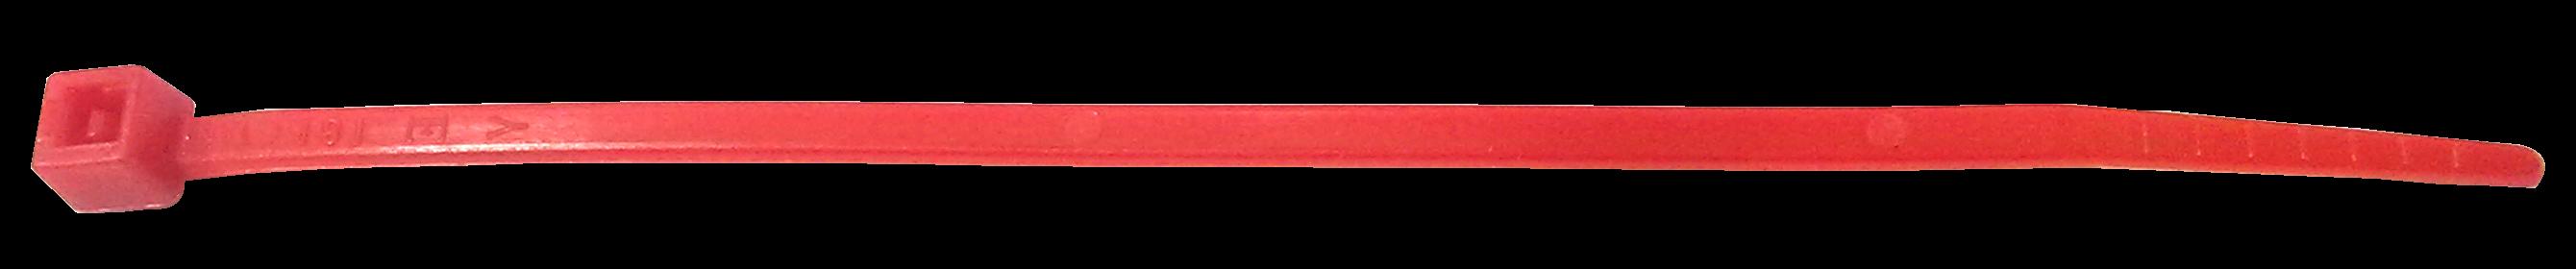 Стяжка кабельная красная